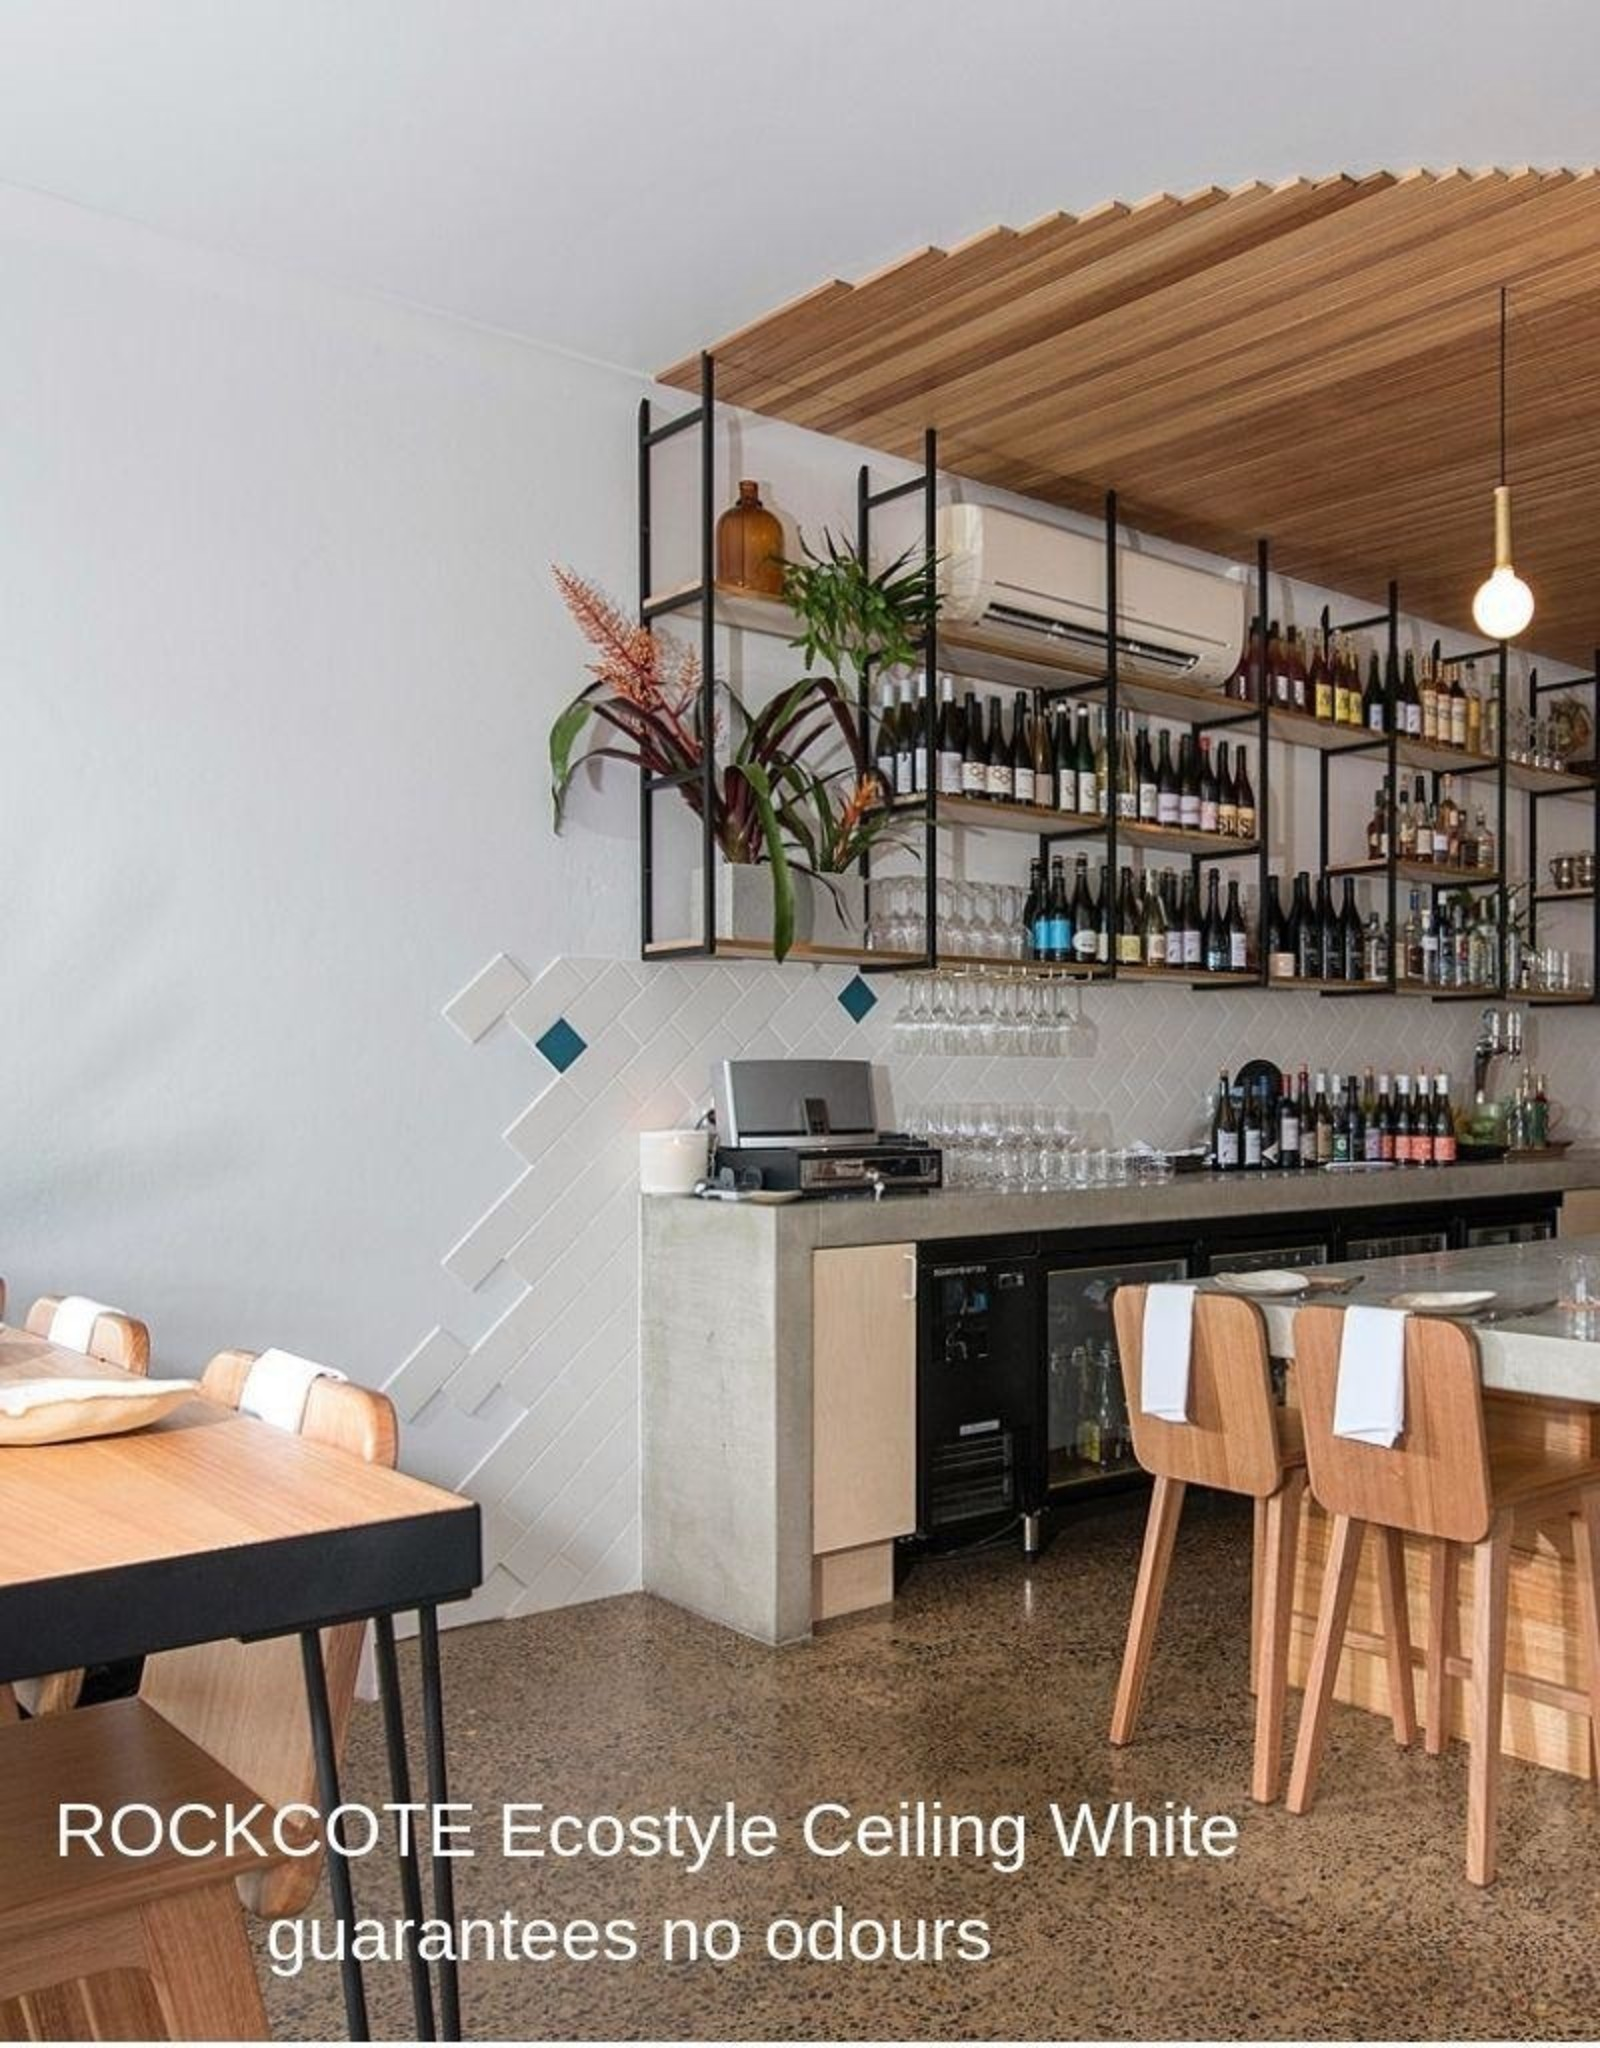 ROCKCOTE Ecostyle Ceiling White